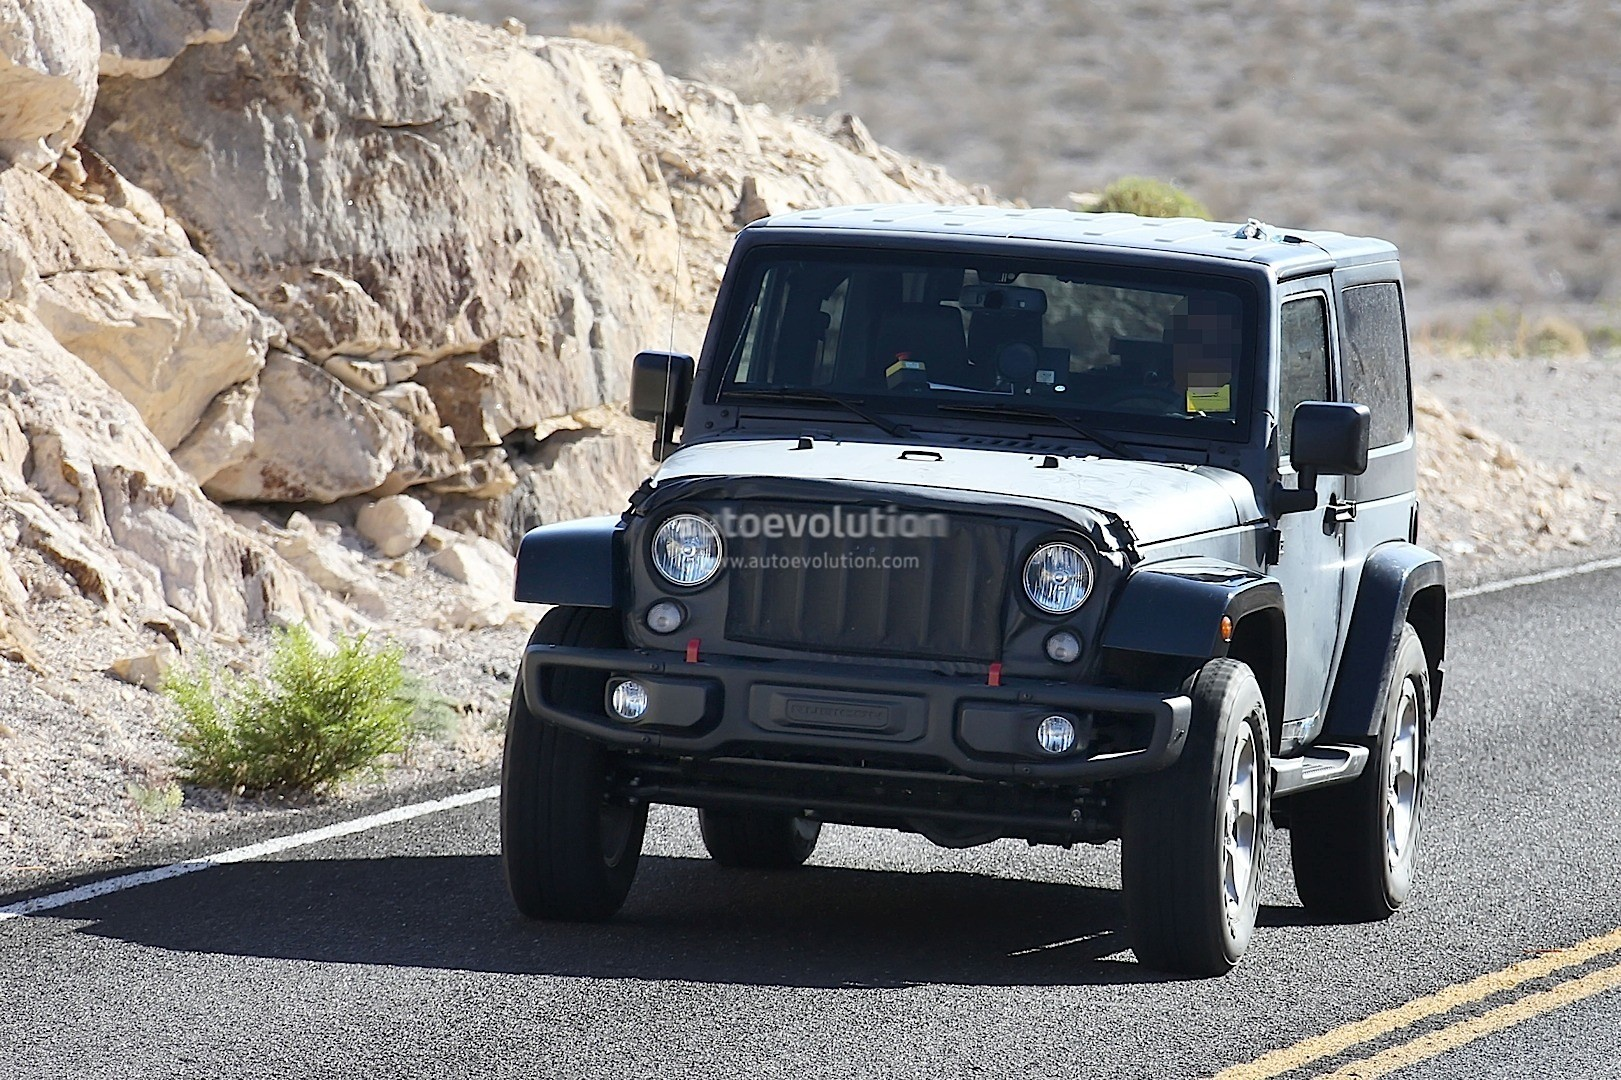 Jeep Wrangler Jl Shows Its Hurricane Turbo Engine on 2016 Jeep Renegade Engine